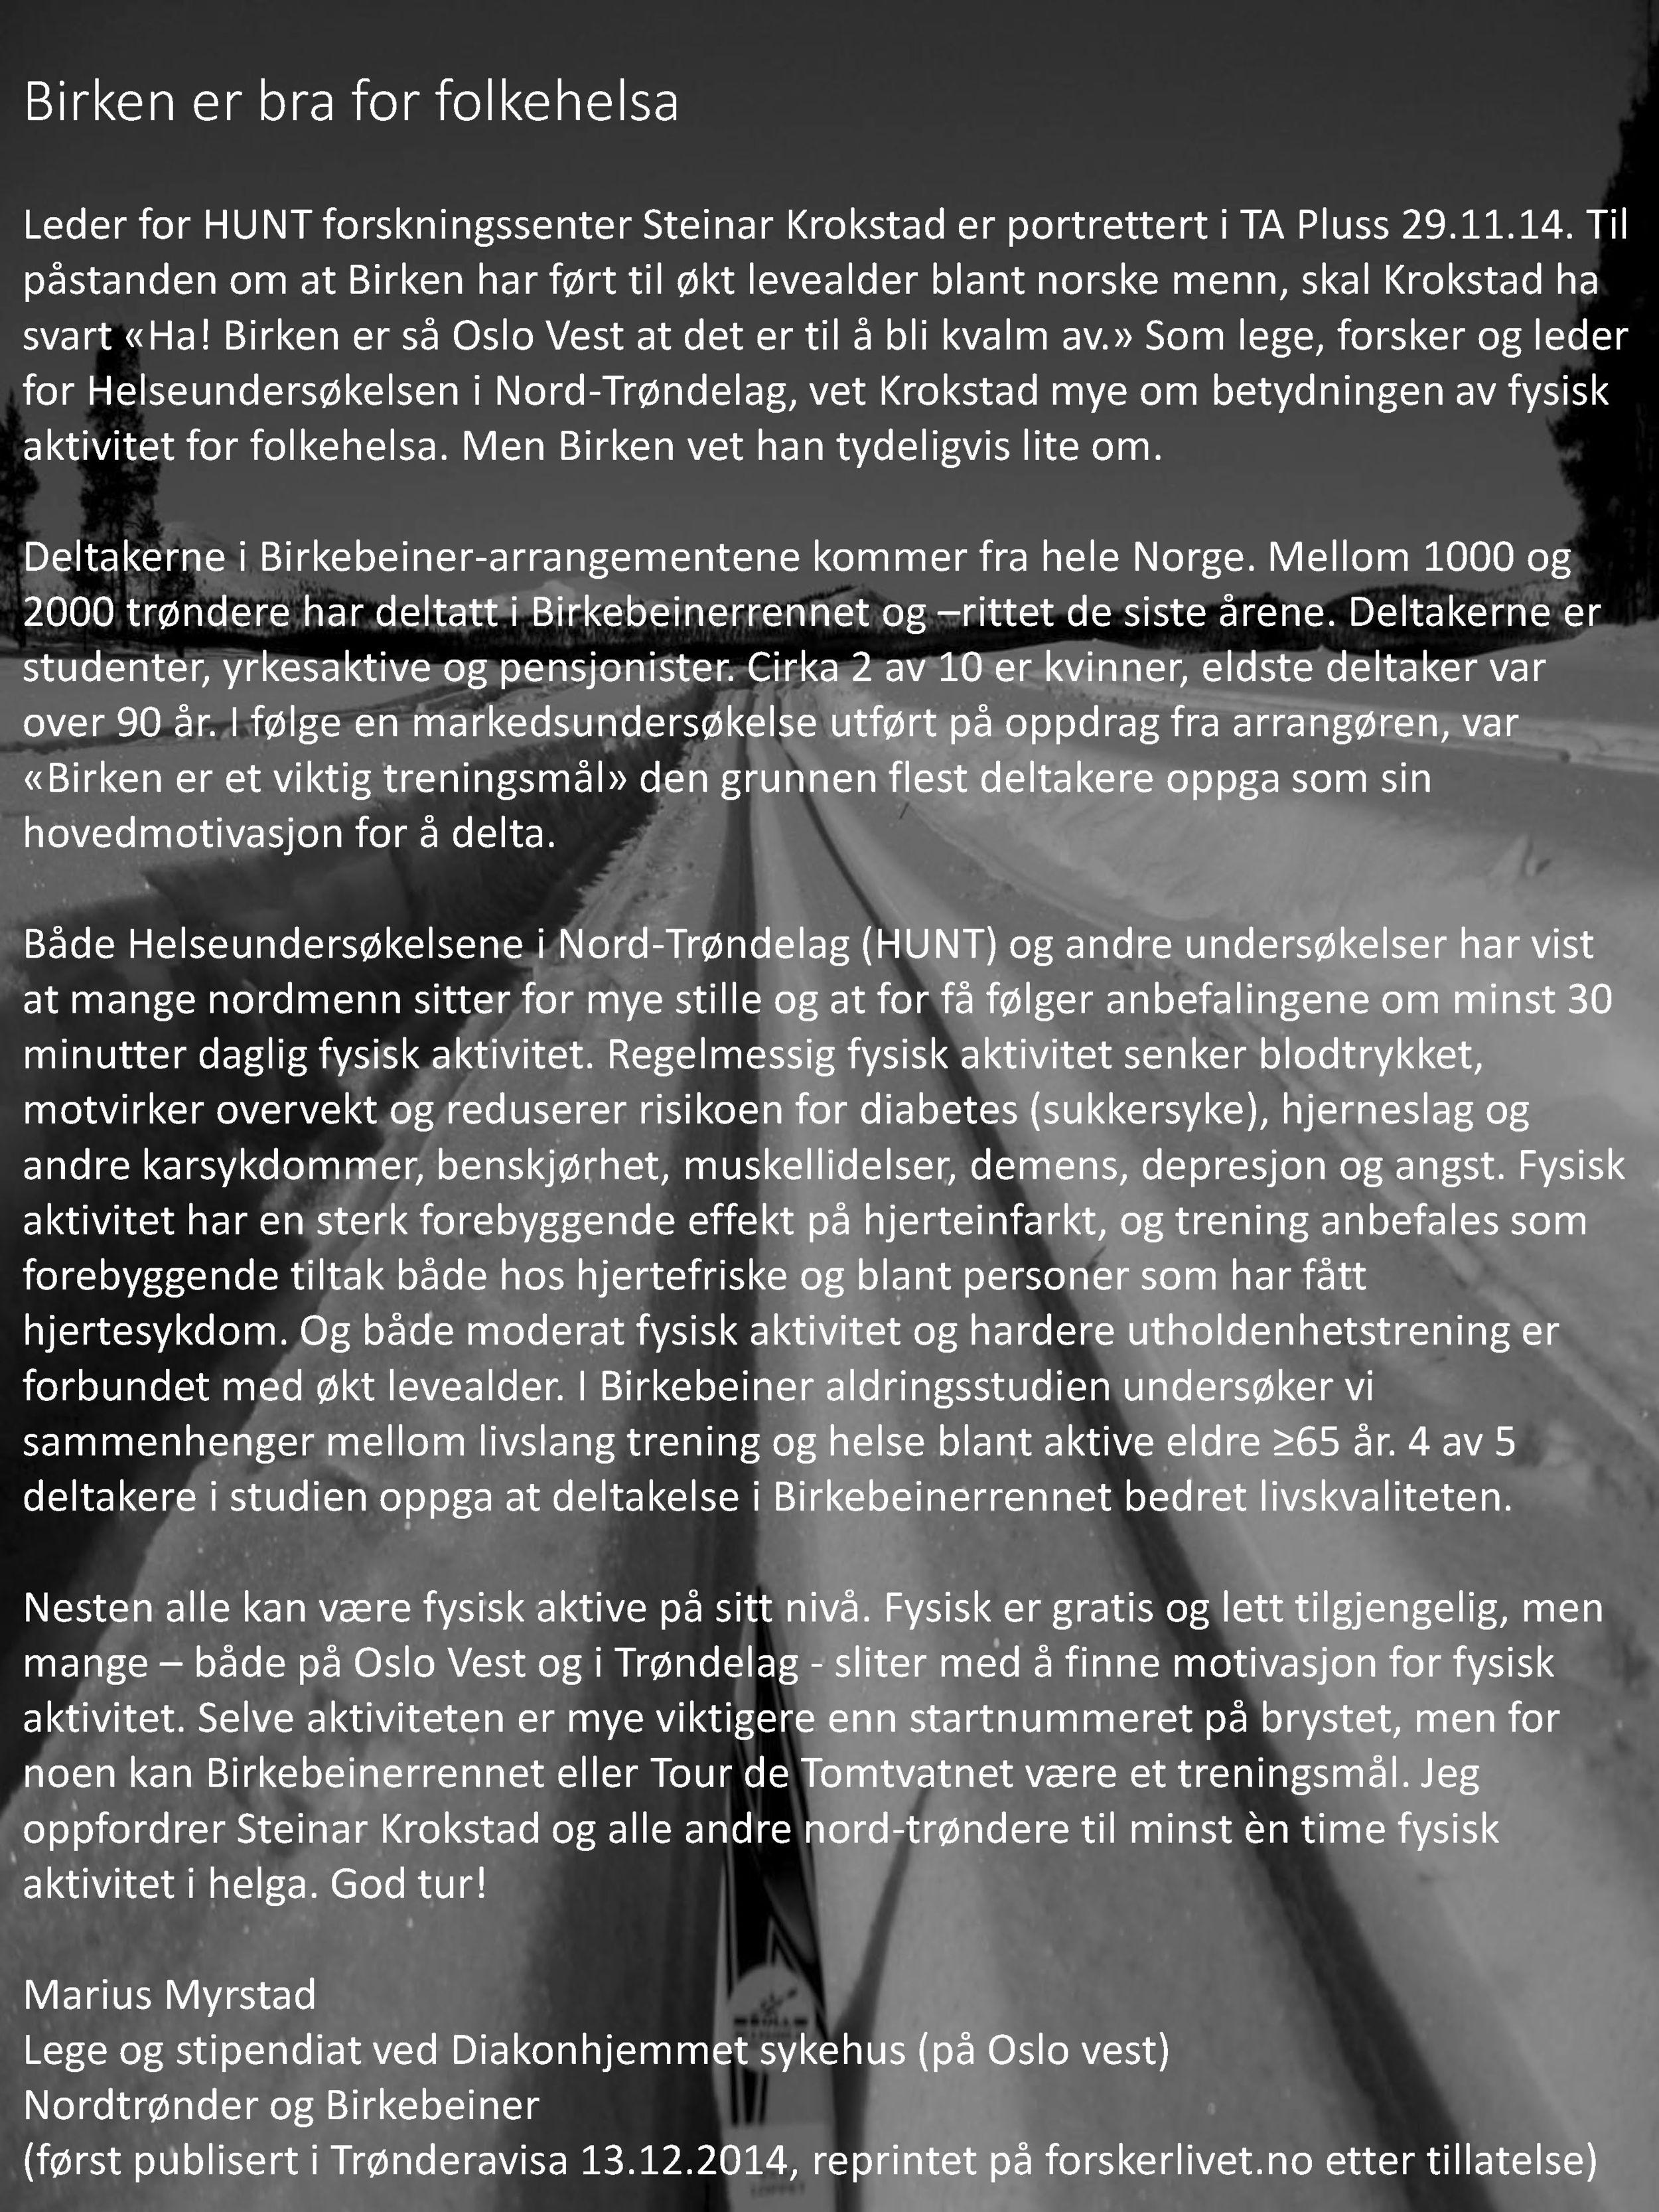 Birken er et viktig treningsmål for mange, og bidrar til bedre helse og livskvalitet. www.forskerlivet.no